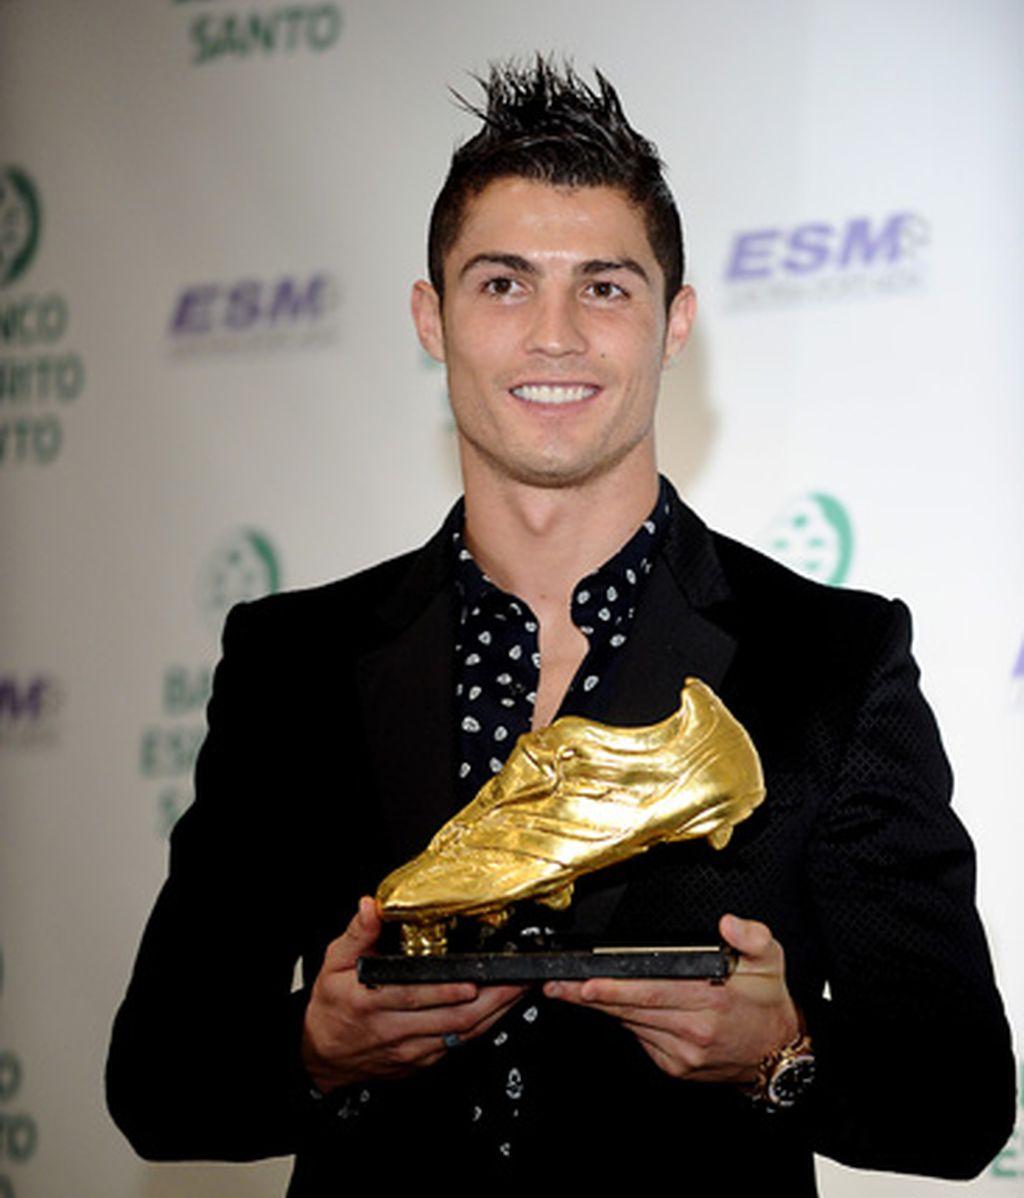 El anillaco de Irina Shayk en la entrega de la Bota de Oro a Cristiano Ronaldo